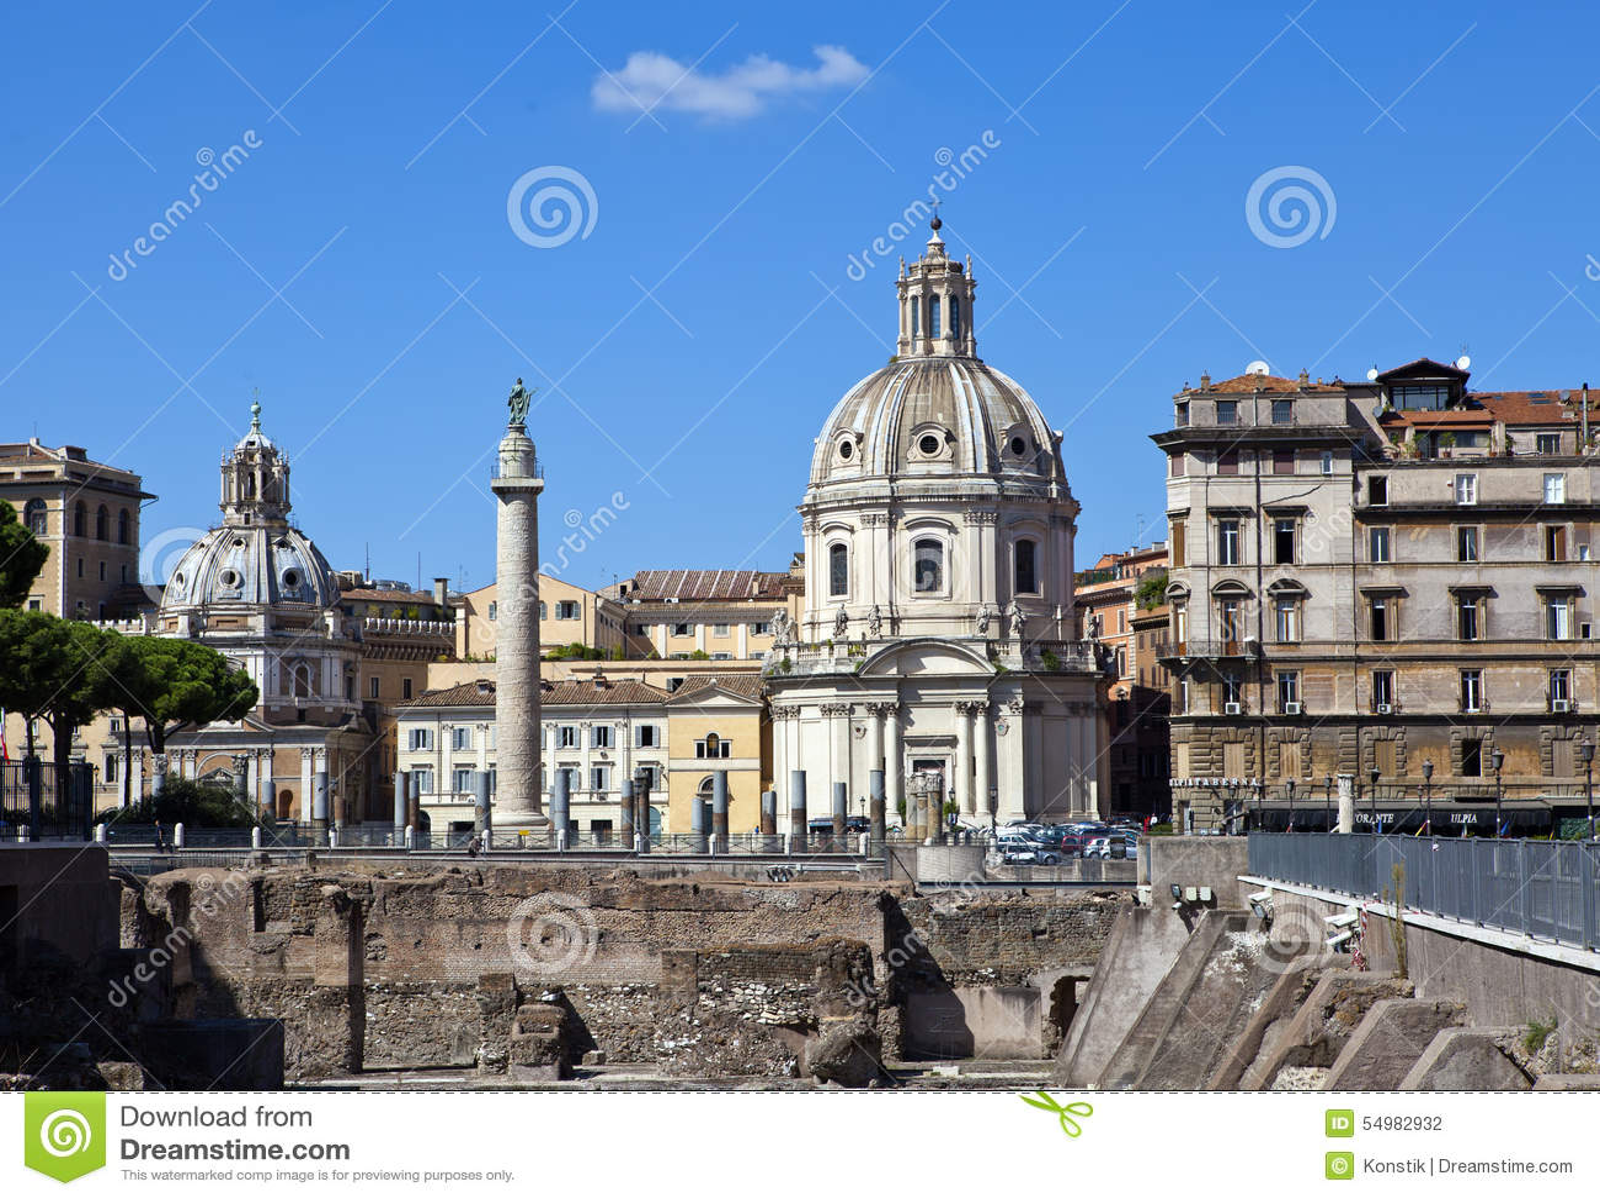 Italy. Rome. Trojan column, churches of Santa Maria di Loreto and Santissima Nome di Maria (Most Holy Name of Mary ),and ruins of